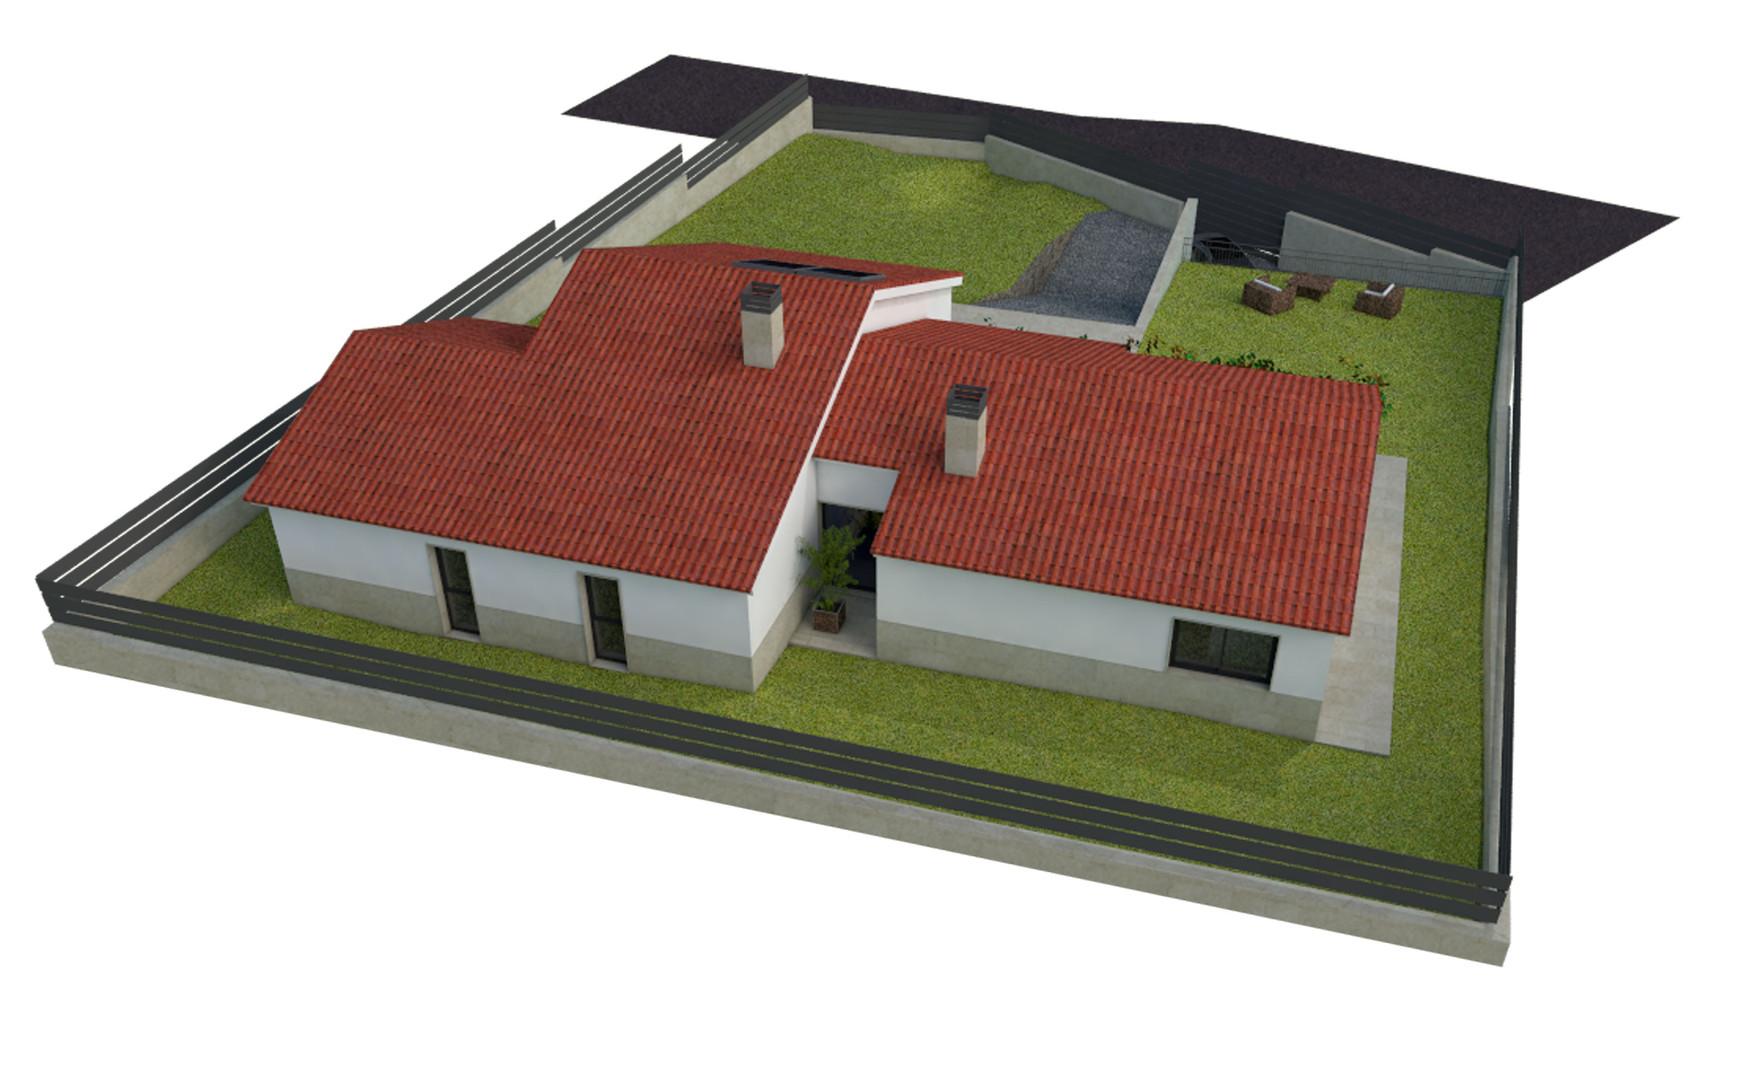 arquitectura-senmais-10.20.07.jpg